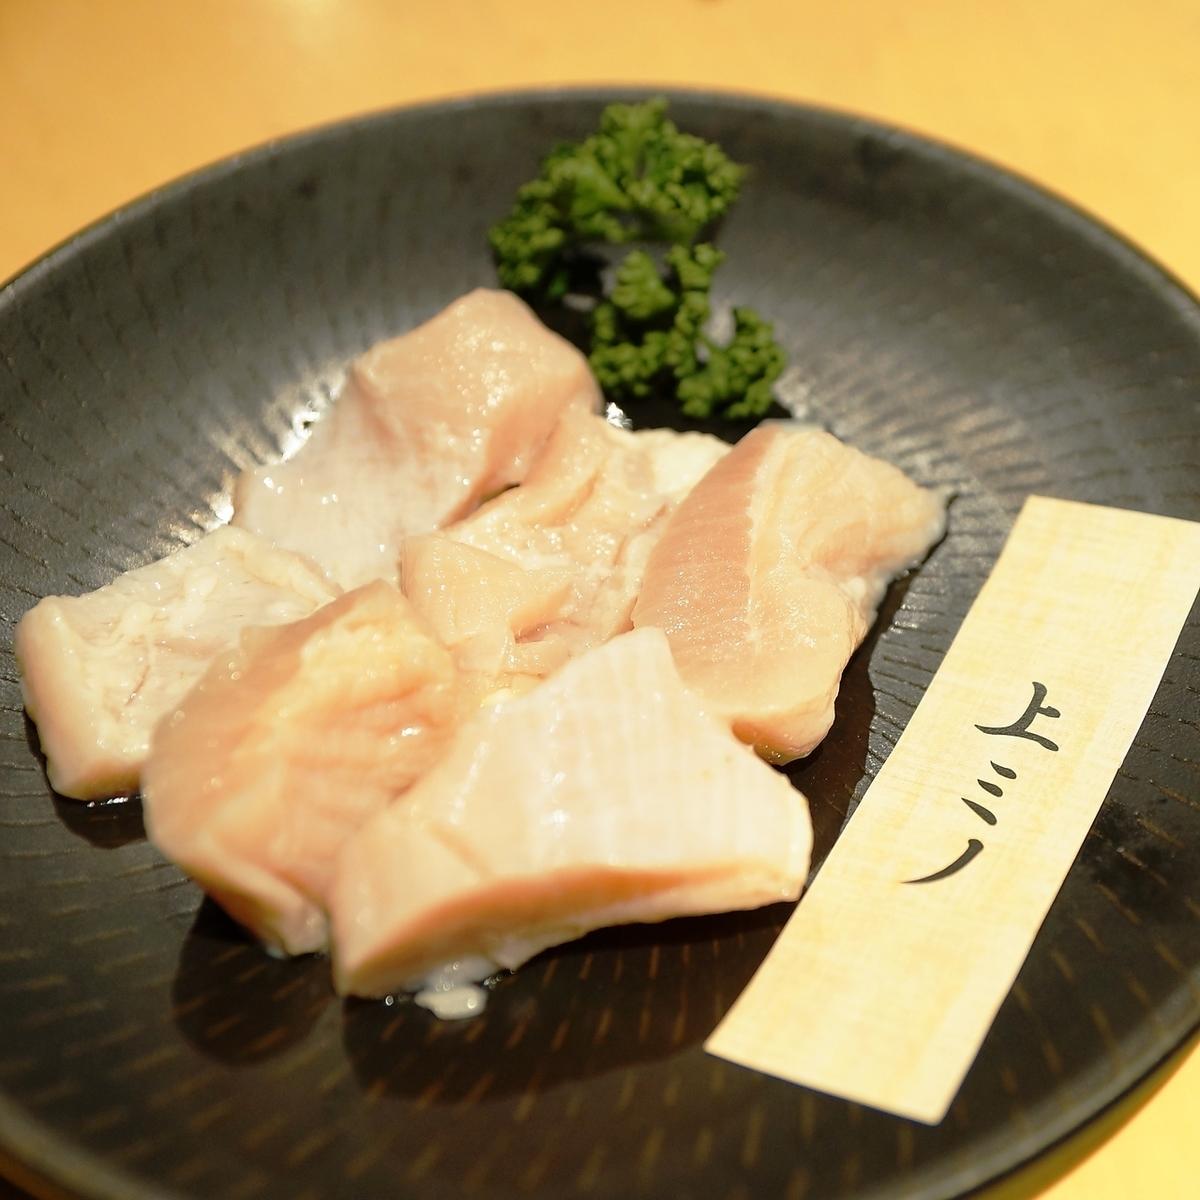 Minamino(味噌或盐传奇)